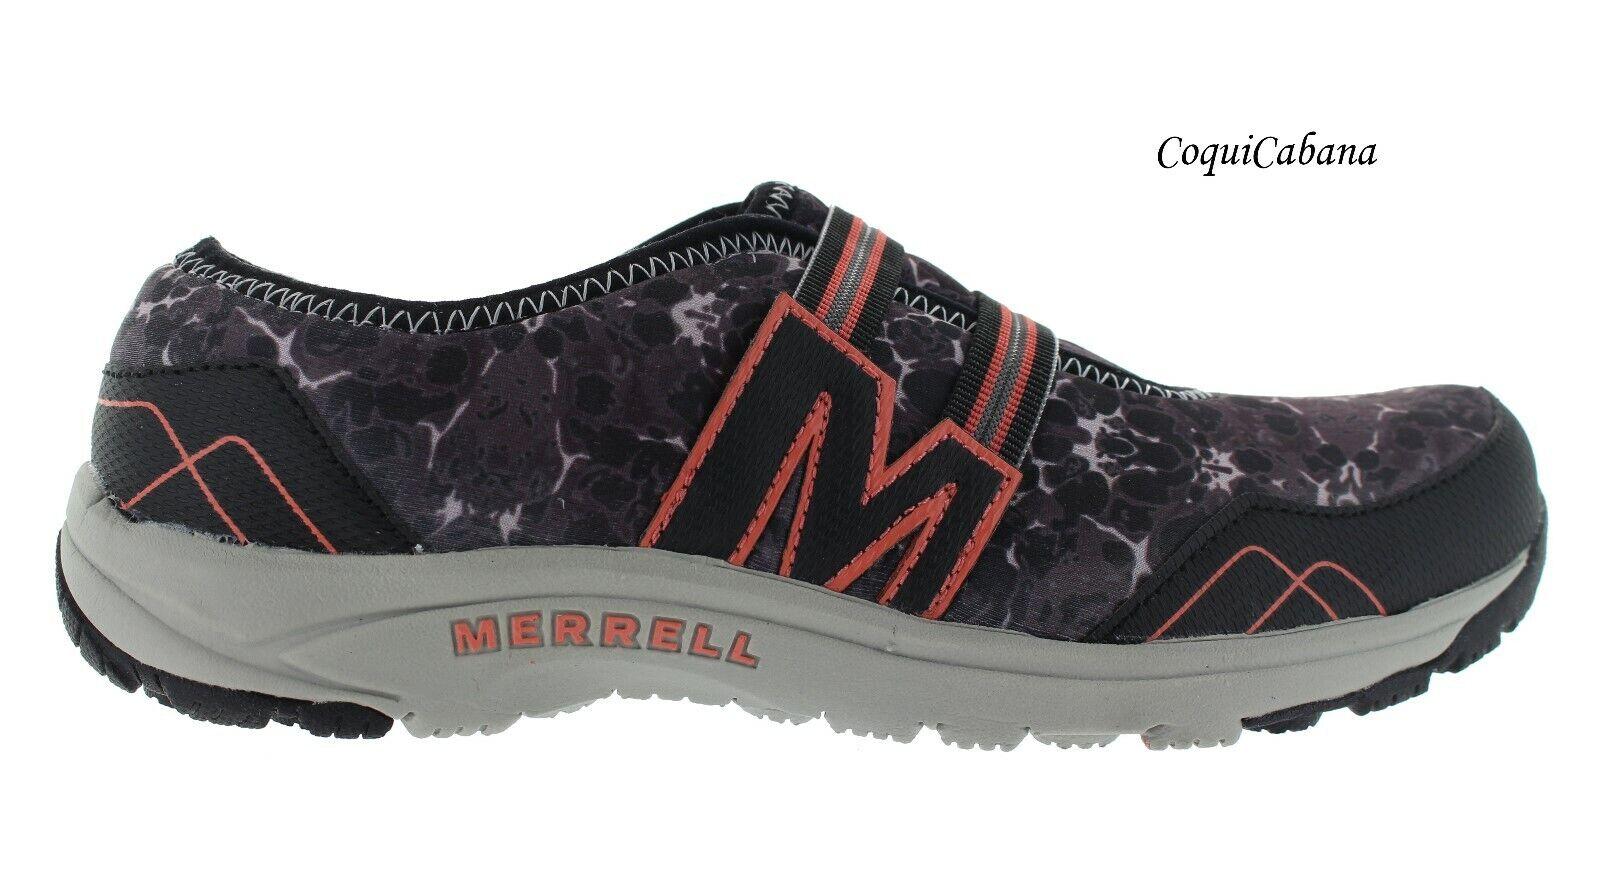 Merrel Women's  Kamori Eden  Multicolor Sneakers Size 9.5 NIB